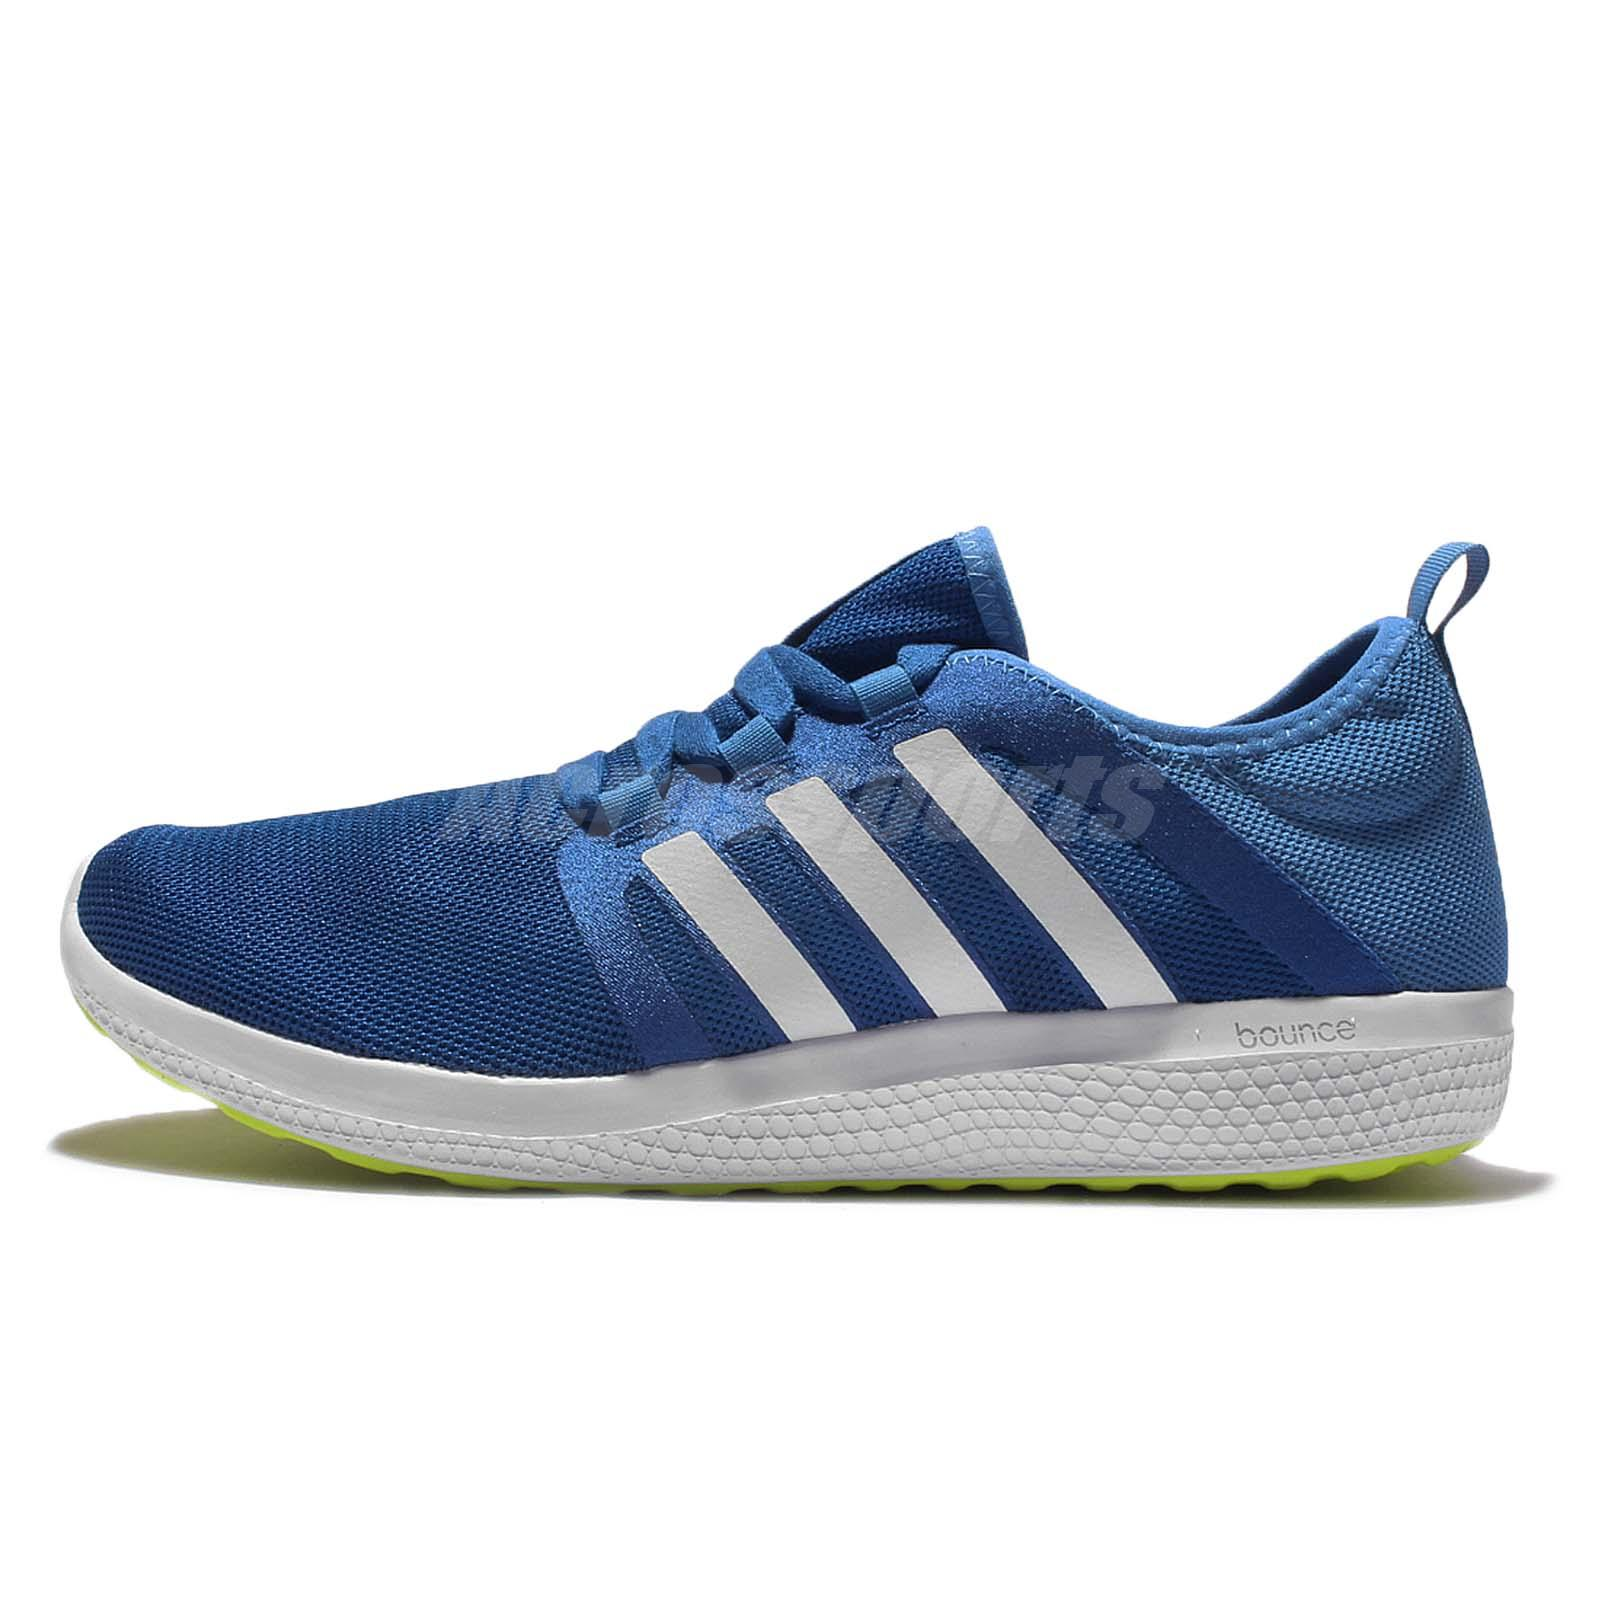 28edc510bf1bc adidas CC Fresh Bounce M Blue White Green Men Running Shoes Sneakers AQ3128